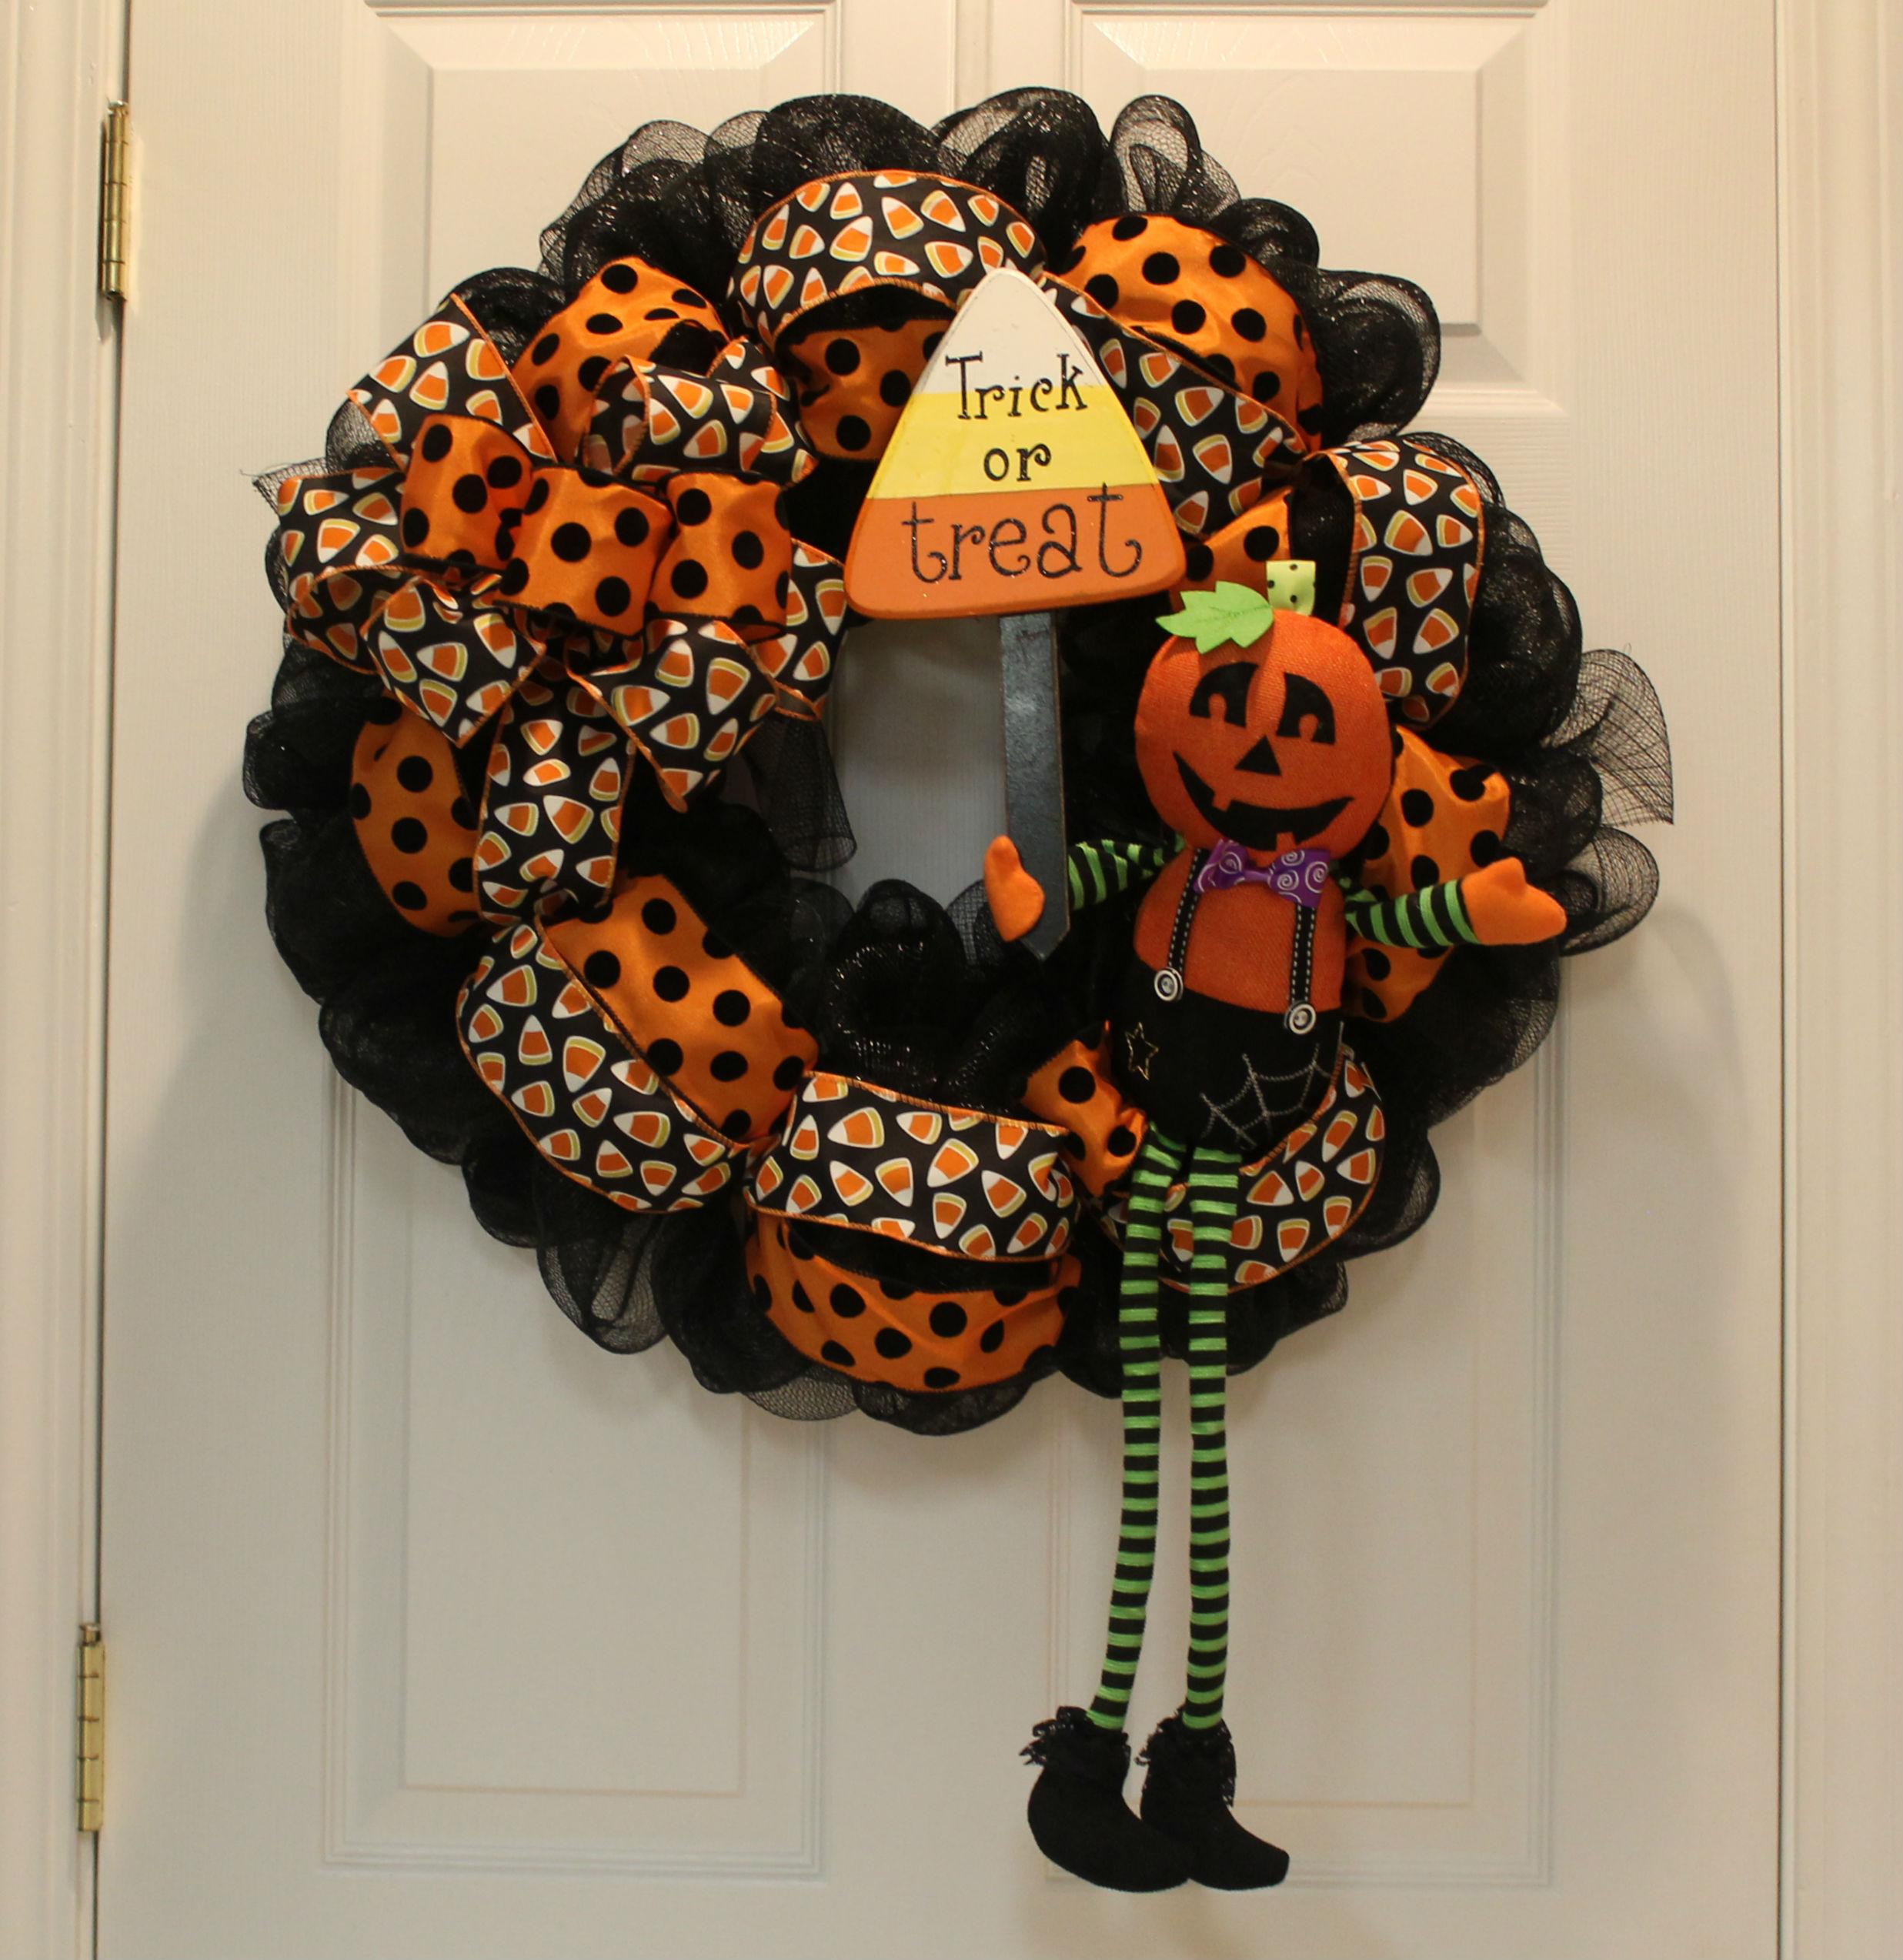 Diy Mesh Waving Jack O 39 Lantern Halloween Wreath The